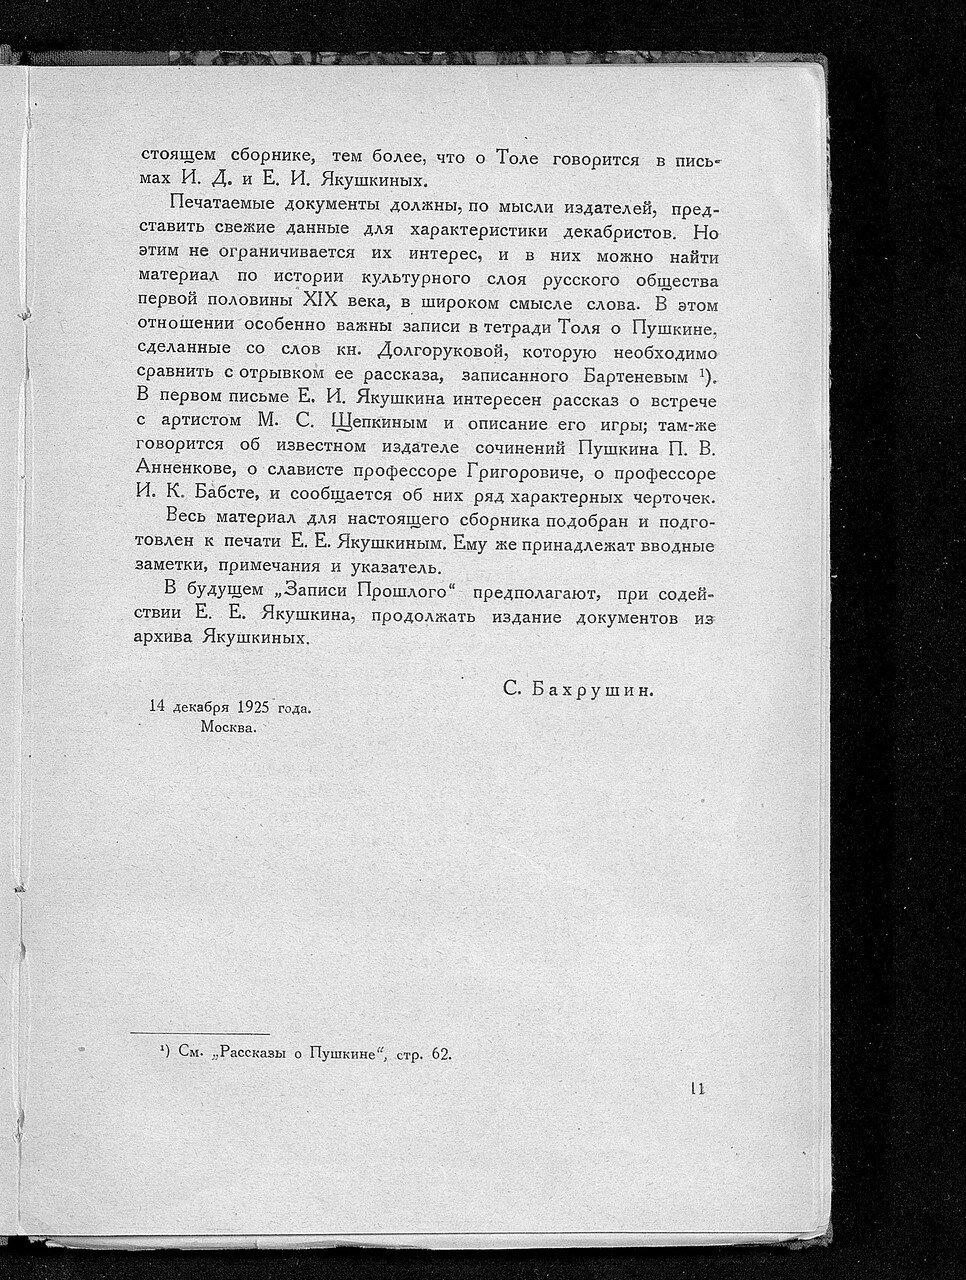 https://img-fotki.yandex.ru/get/893240/199368979.a0/0_214309_7252f519_XXXL.jpg